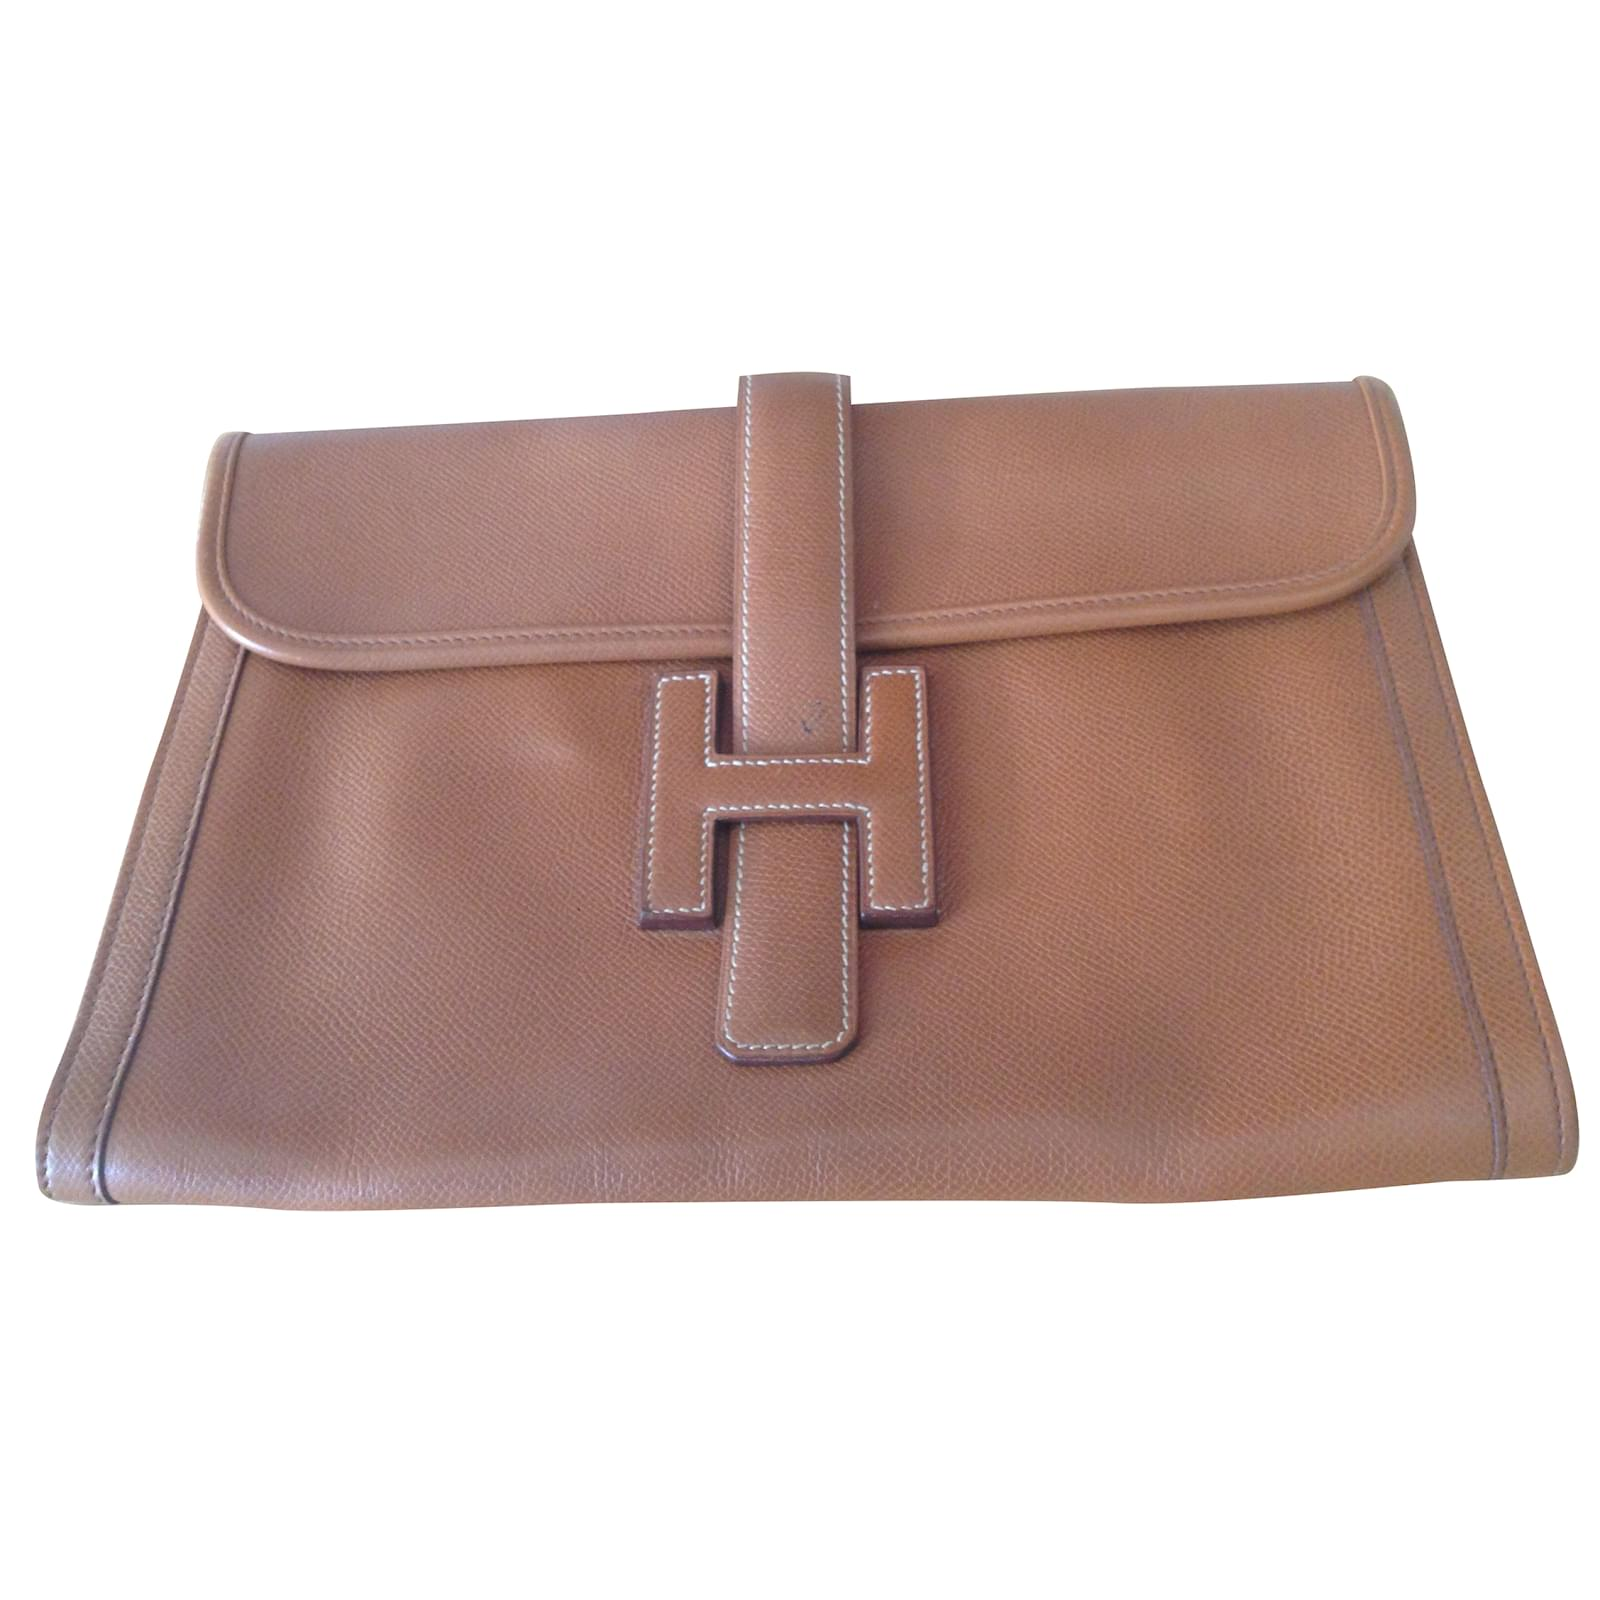 d4ab380f7784 Hermès Hermes Jige PM Clutch bags Leather Brown ref.38793 - Joli Closet